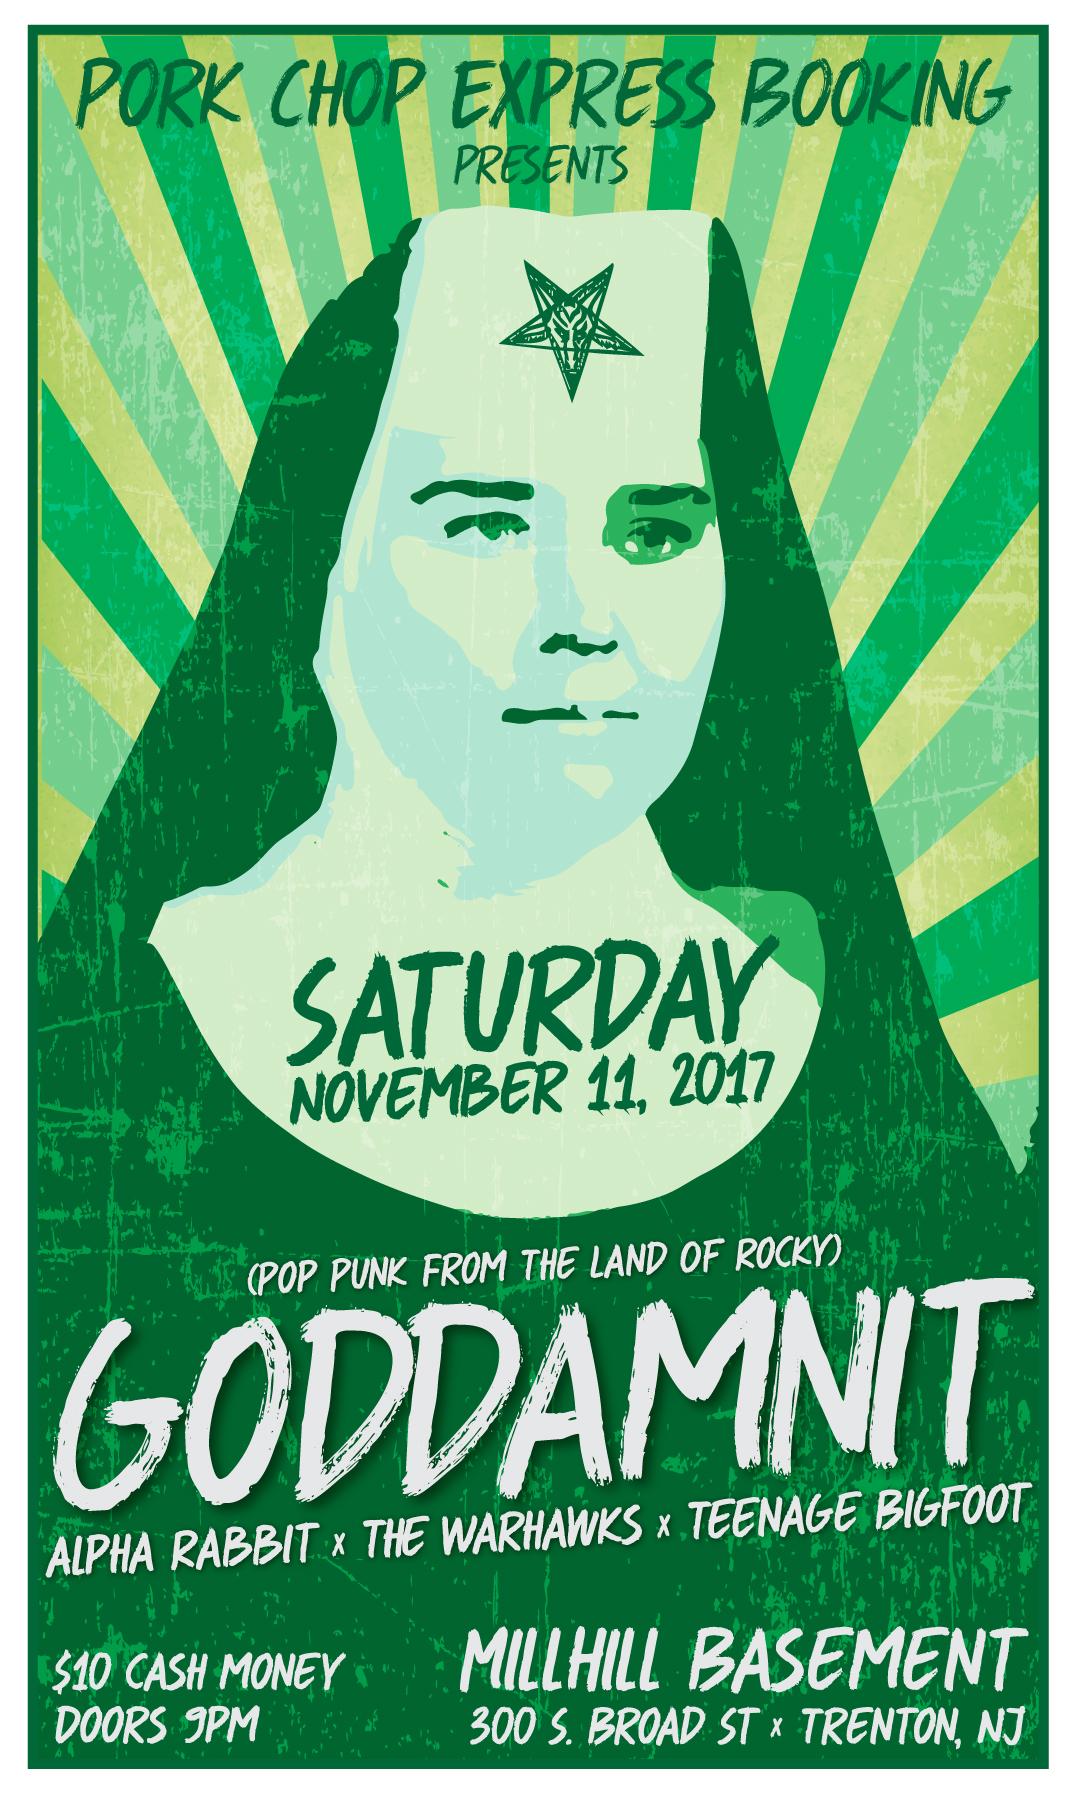 GODDDAMNIT  November 11, 2017 Mill Hill Basement